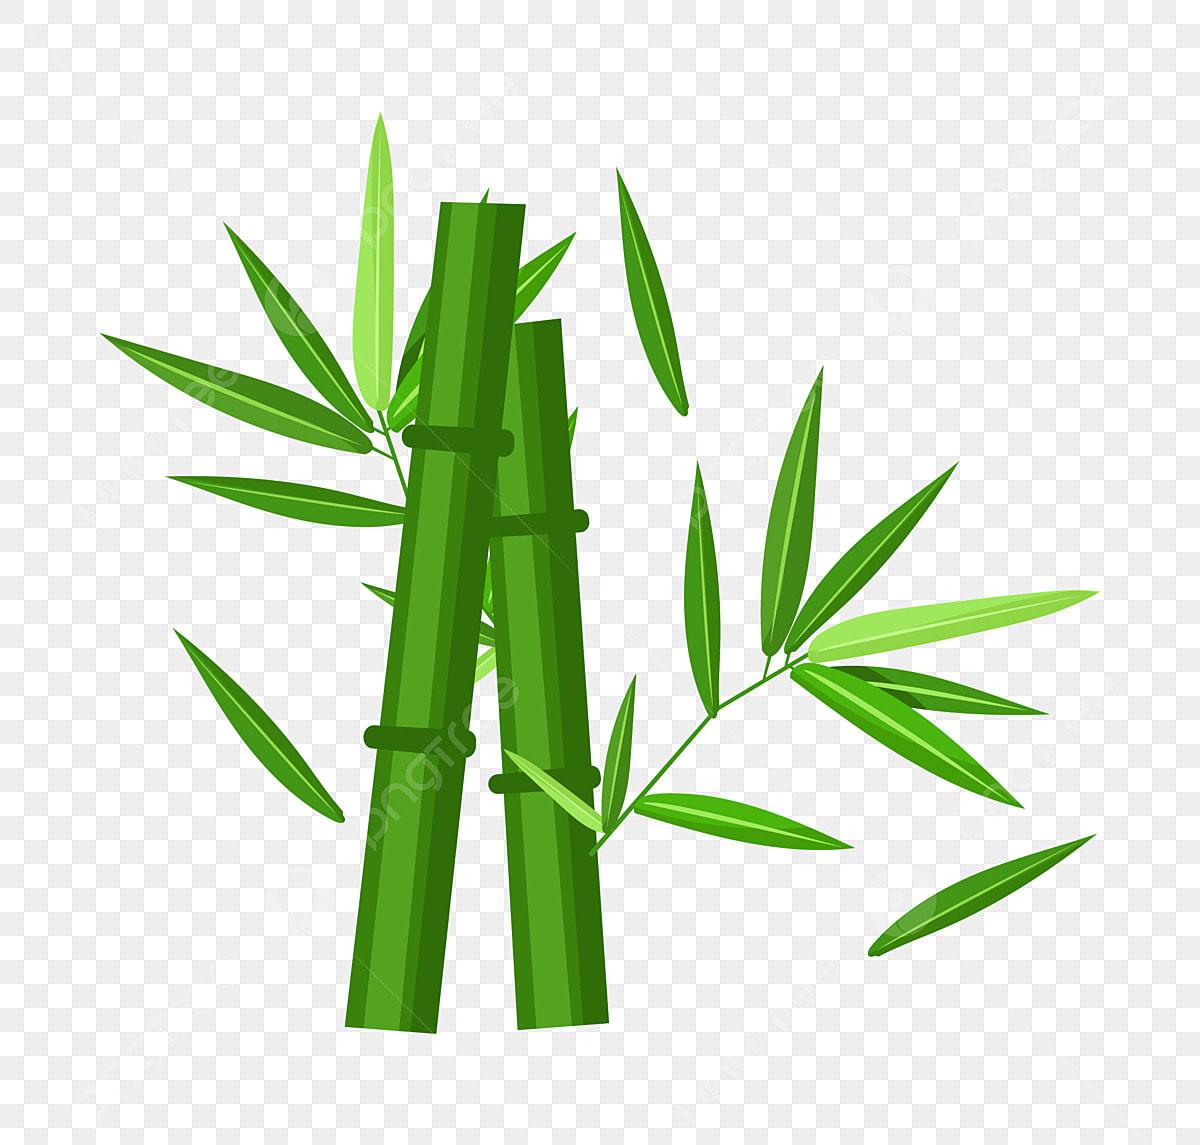 Bambou Vert Illustration De Dessin Animé Illustration De